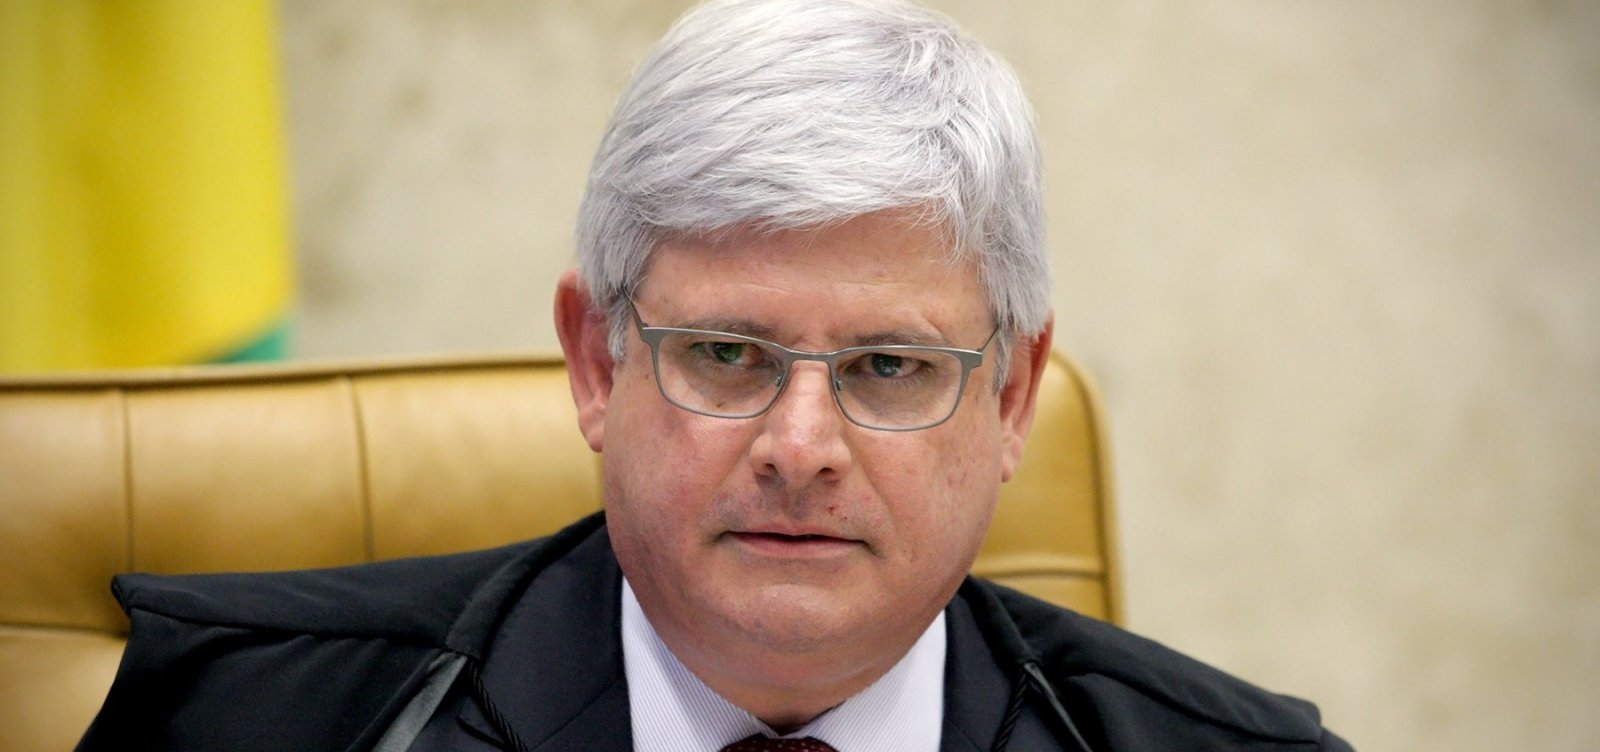 [Janot critica 'intolerância' e declara voto em Haddad]